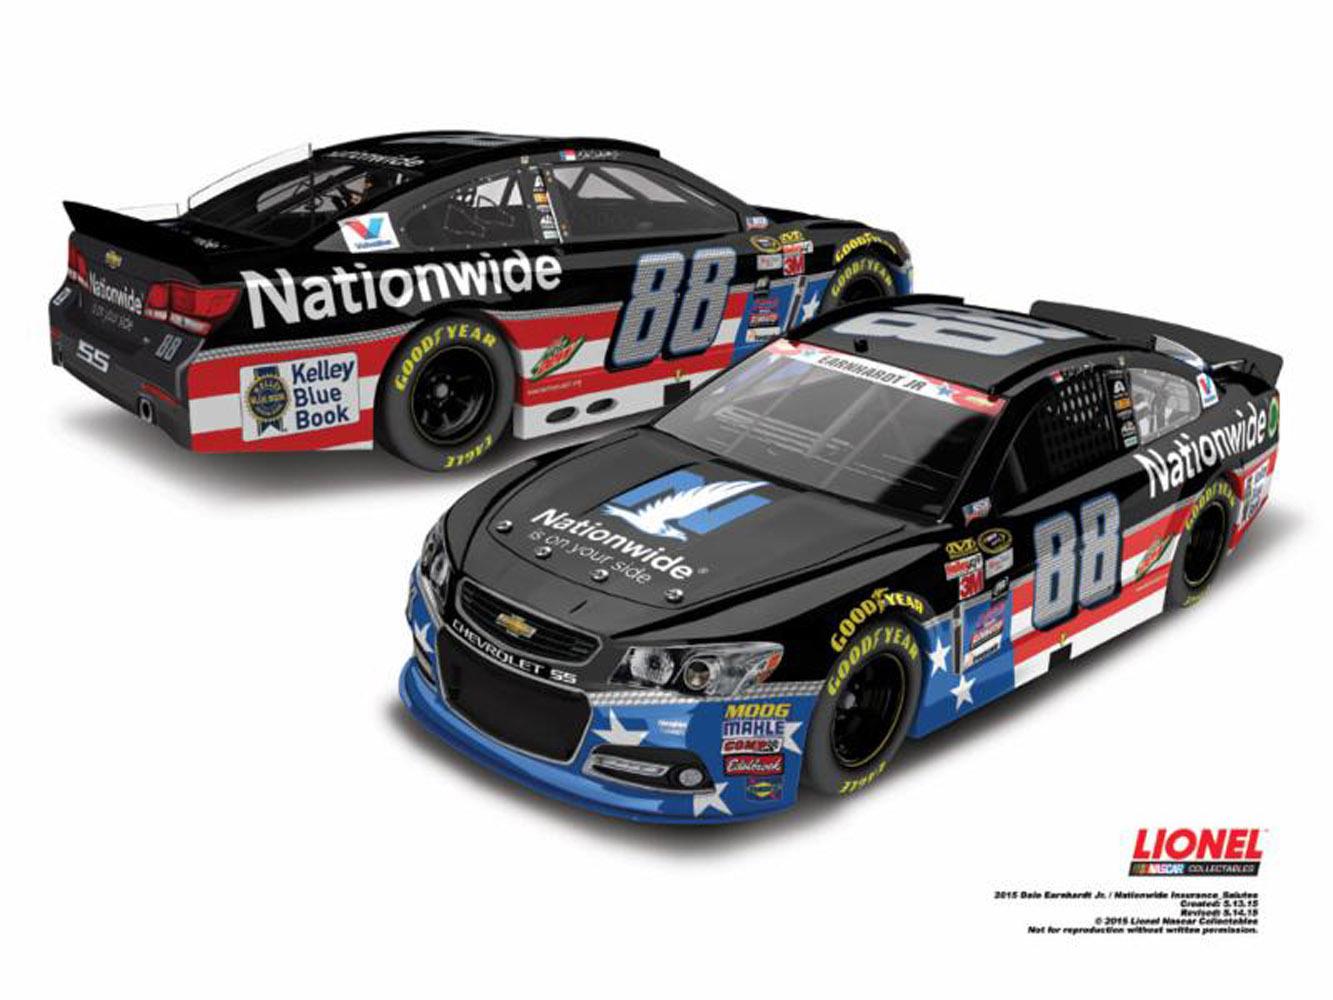 Dale Earnhardt Jr Nationwide American Salutes Diecast Car on Dale Earnhardt Jr Diecast Cars 2015